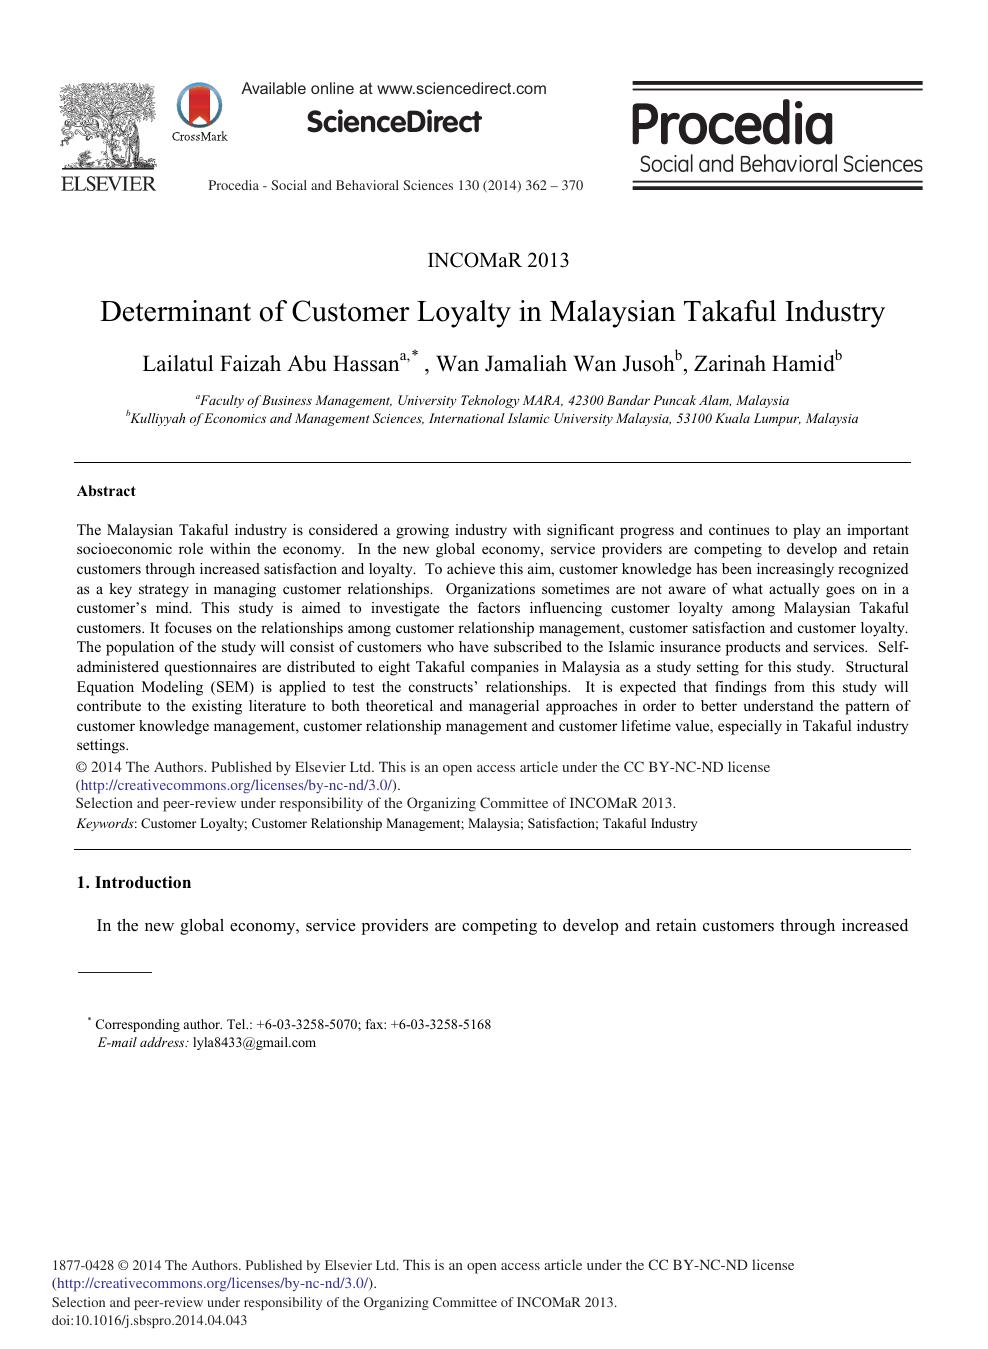 Determinant of Customer Loyalty in Malaysian Takaful